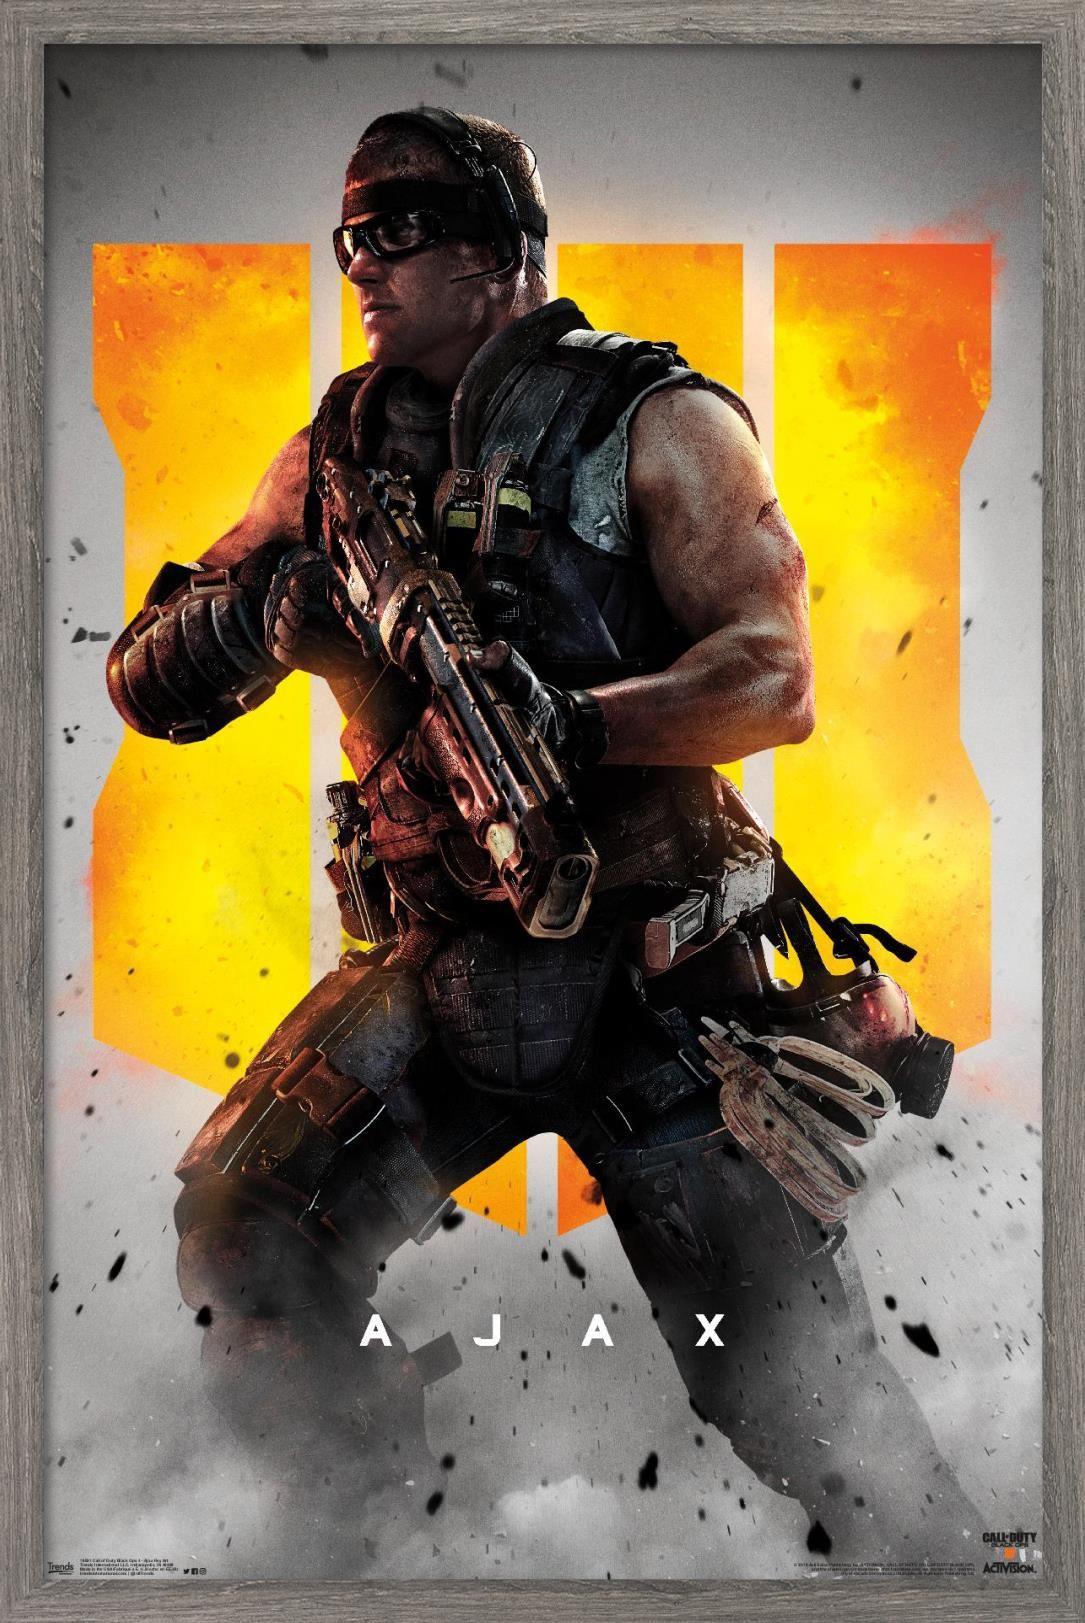 Call Of Duty Black Ops 4 Ajax Key Art Poster Walmart Com In 2021 Black Ops 4 Black Ops Call Of Duty